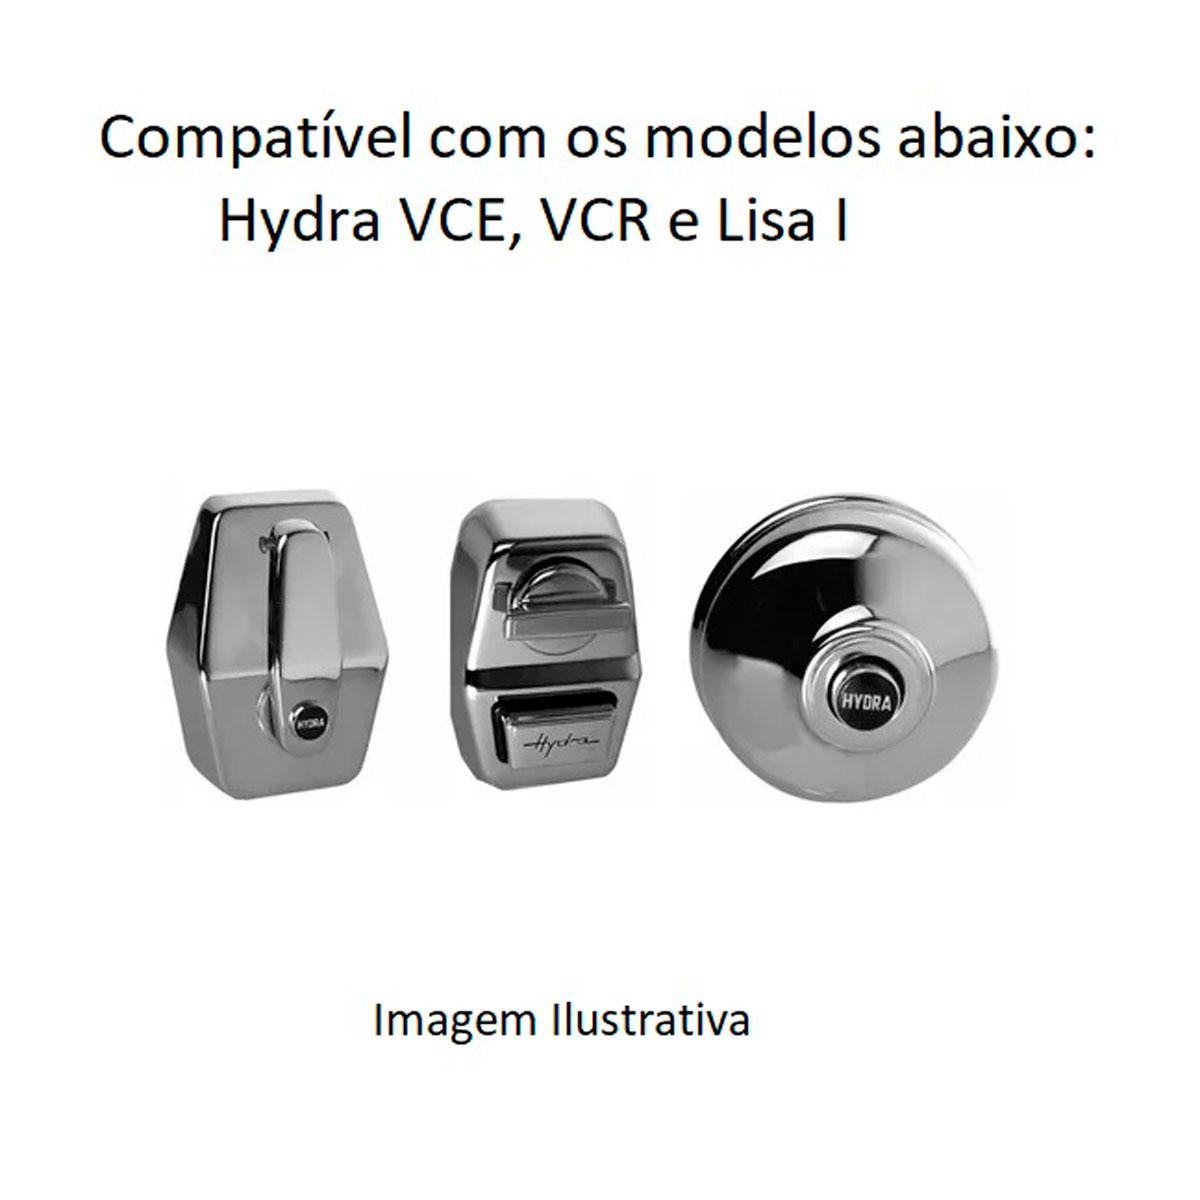 Reparo Válvula Hydra Unificado VCR, VCE, Lisa 1.1/4 Original